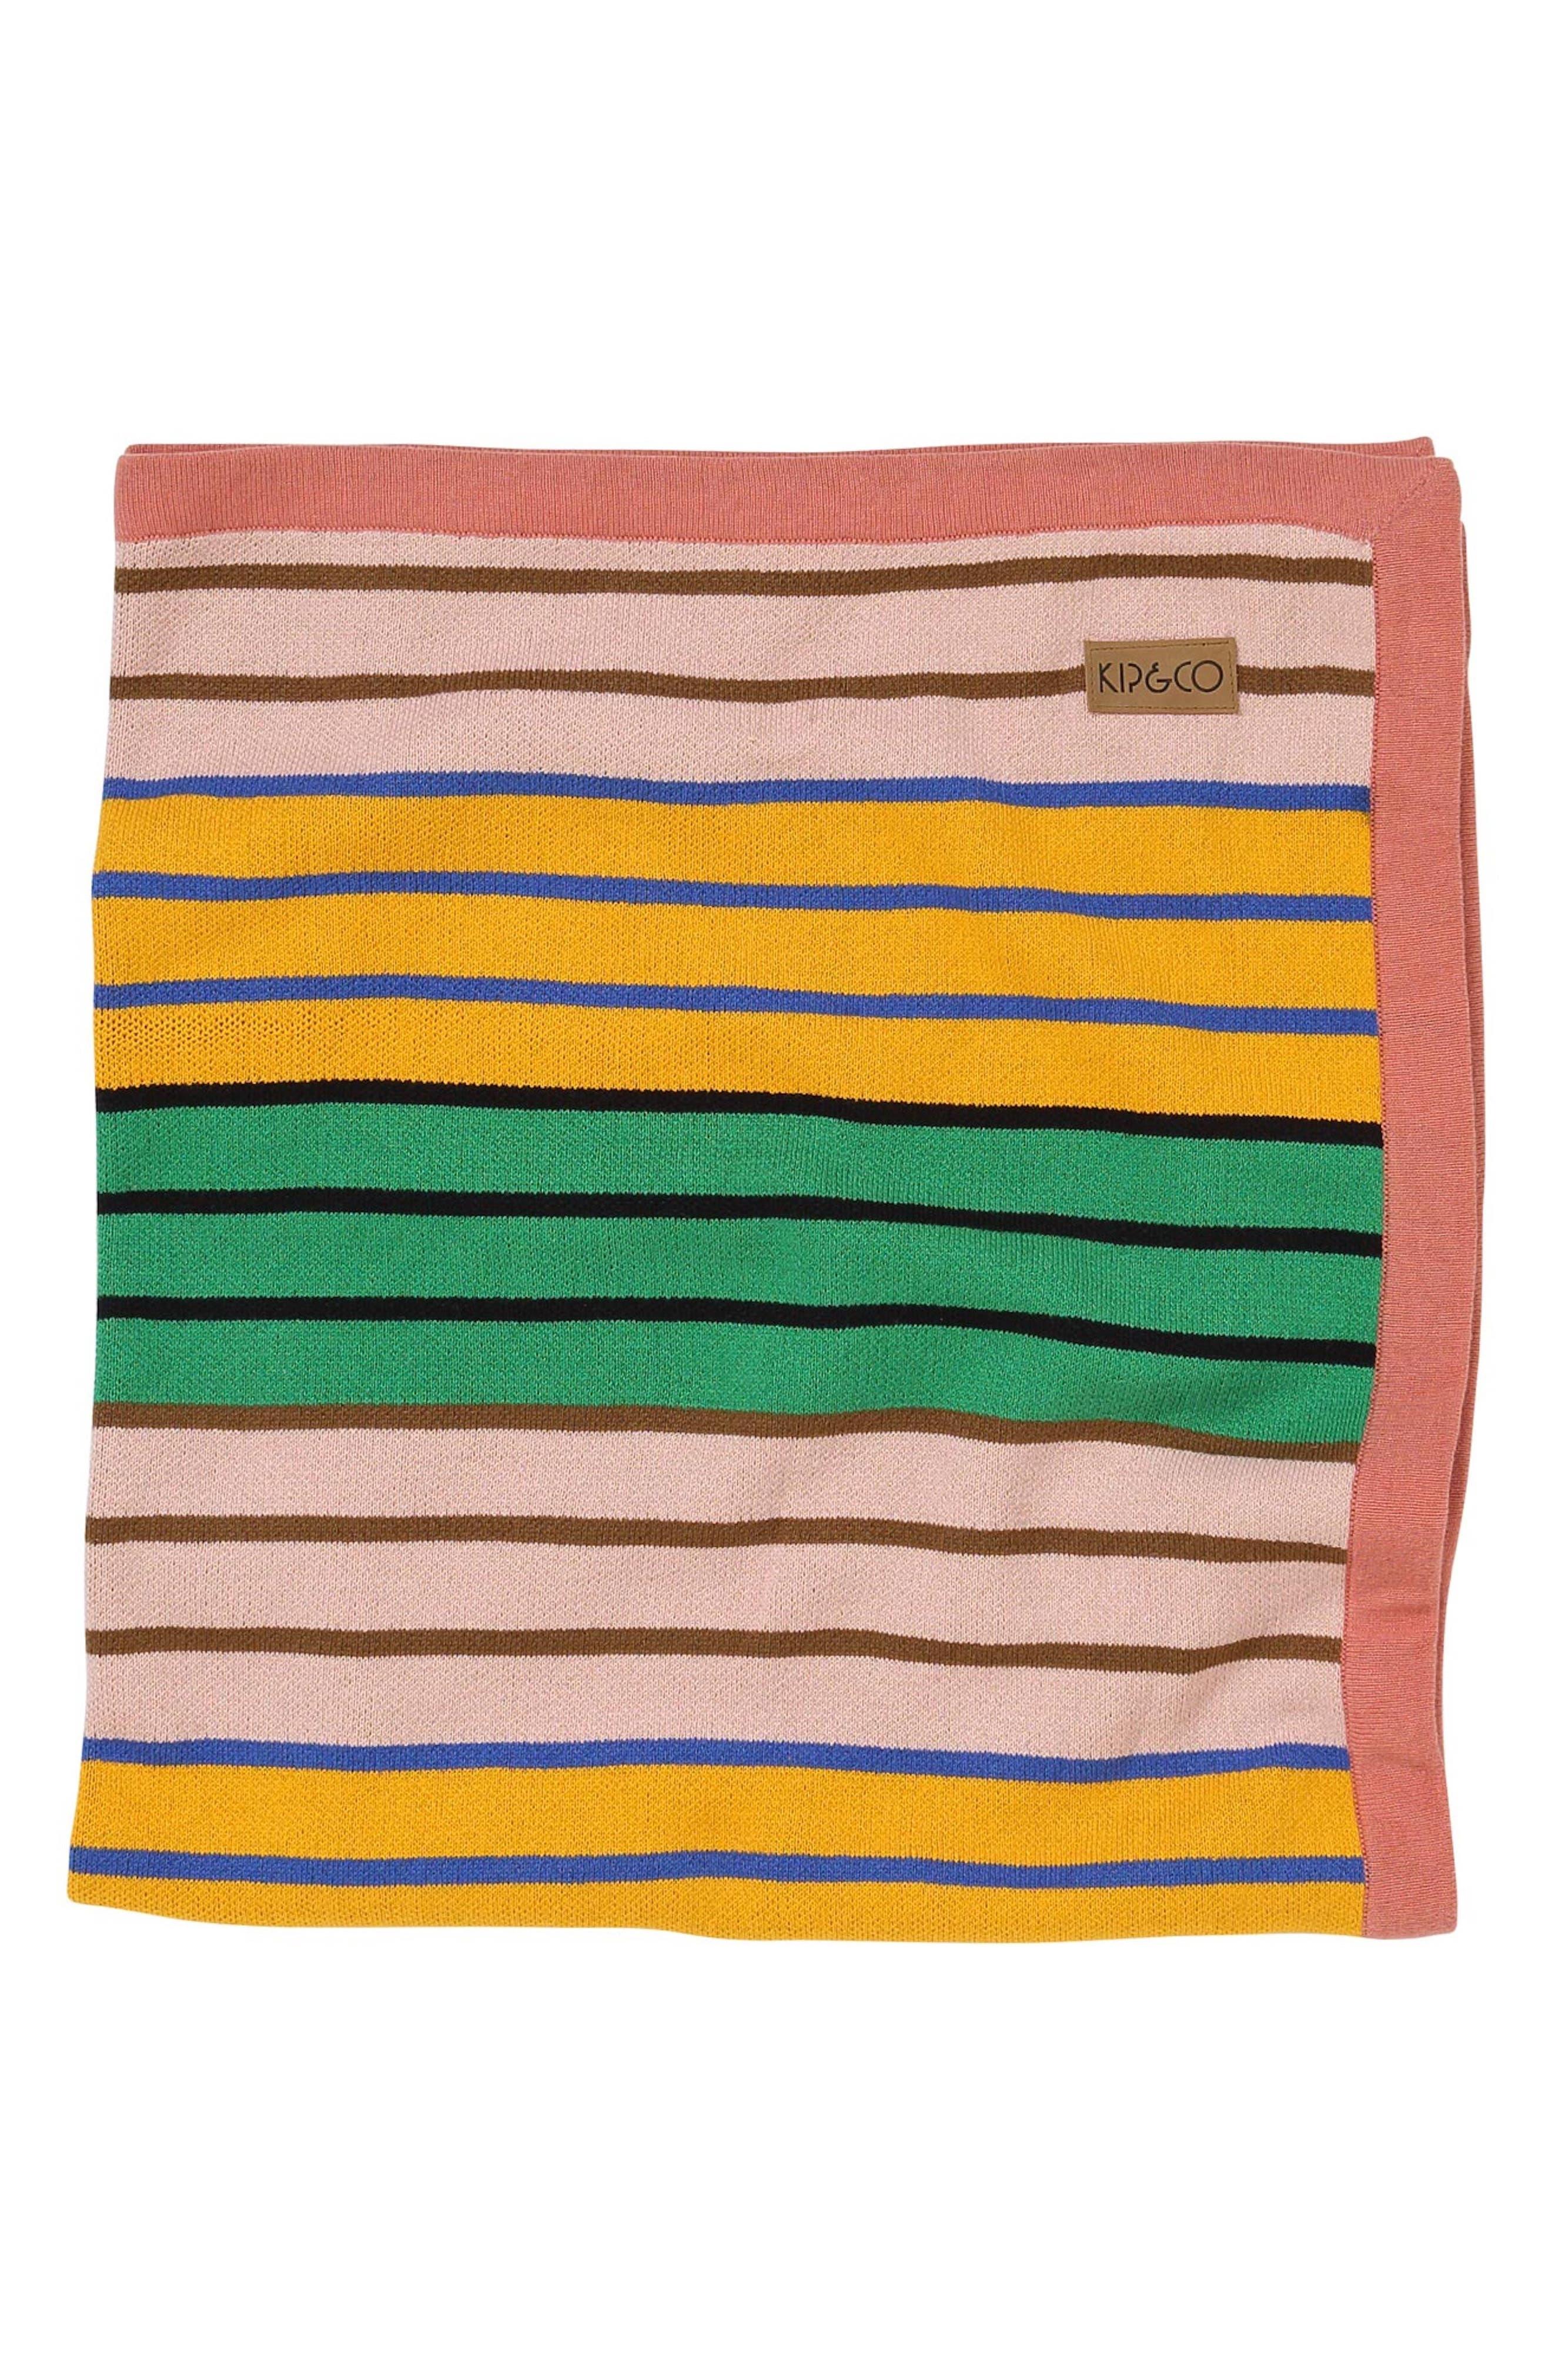 KIP&CO,                             Stripe Knit Cotton Blanket,                             Main thumbnail 1, color,                             300